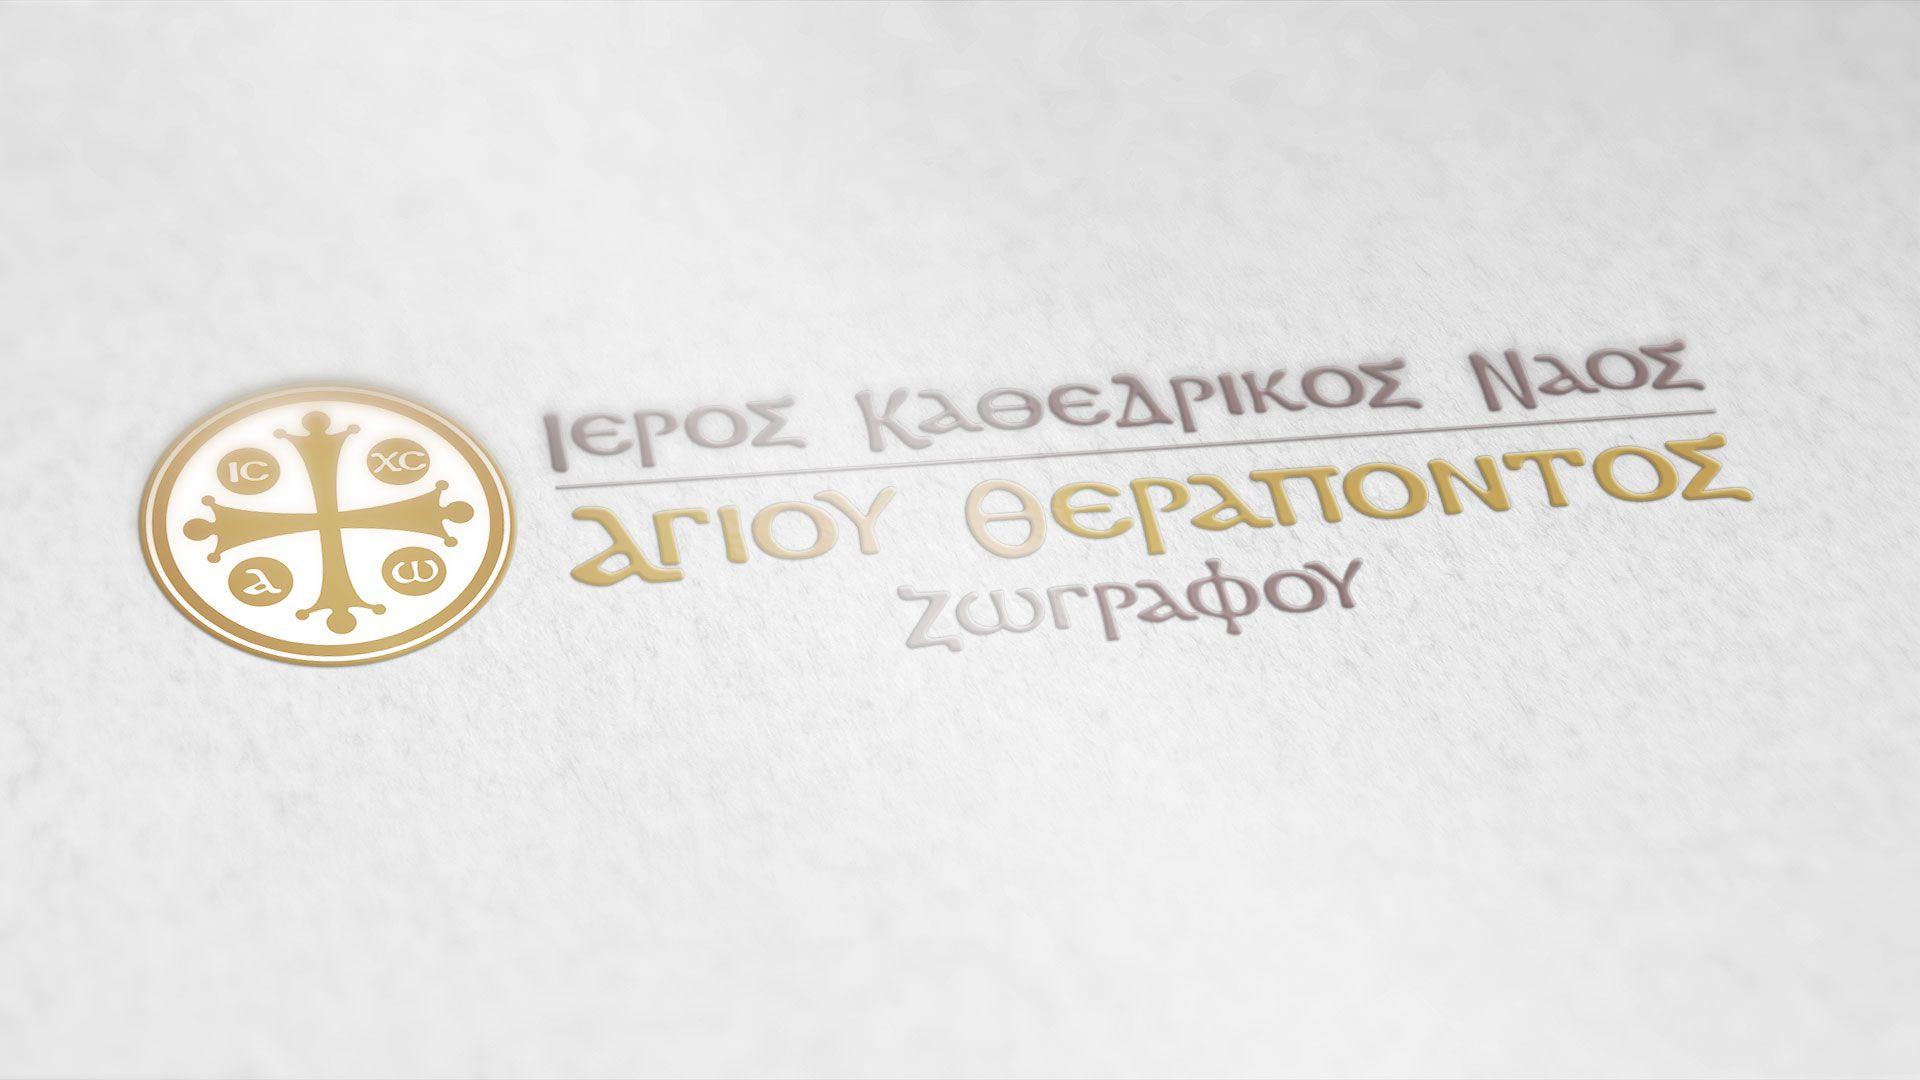 ag-therapon-mockup-logo